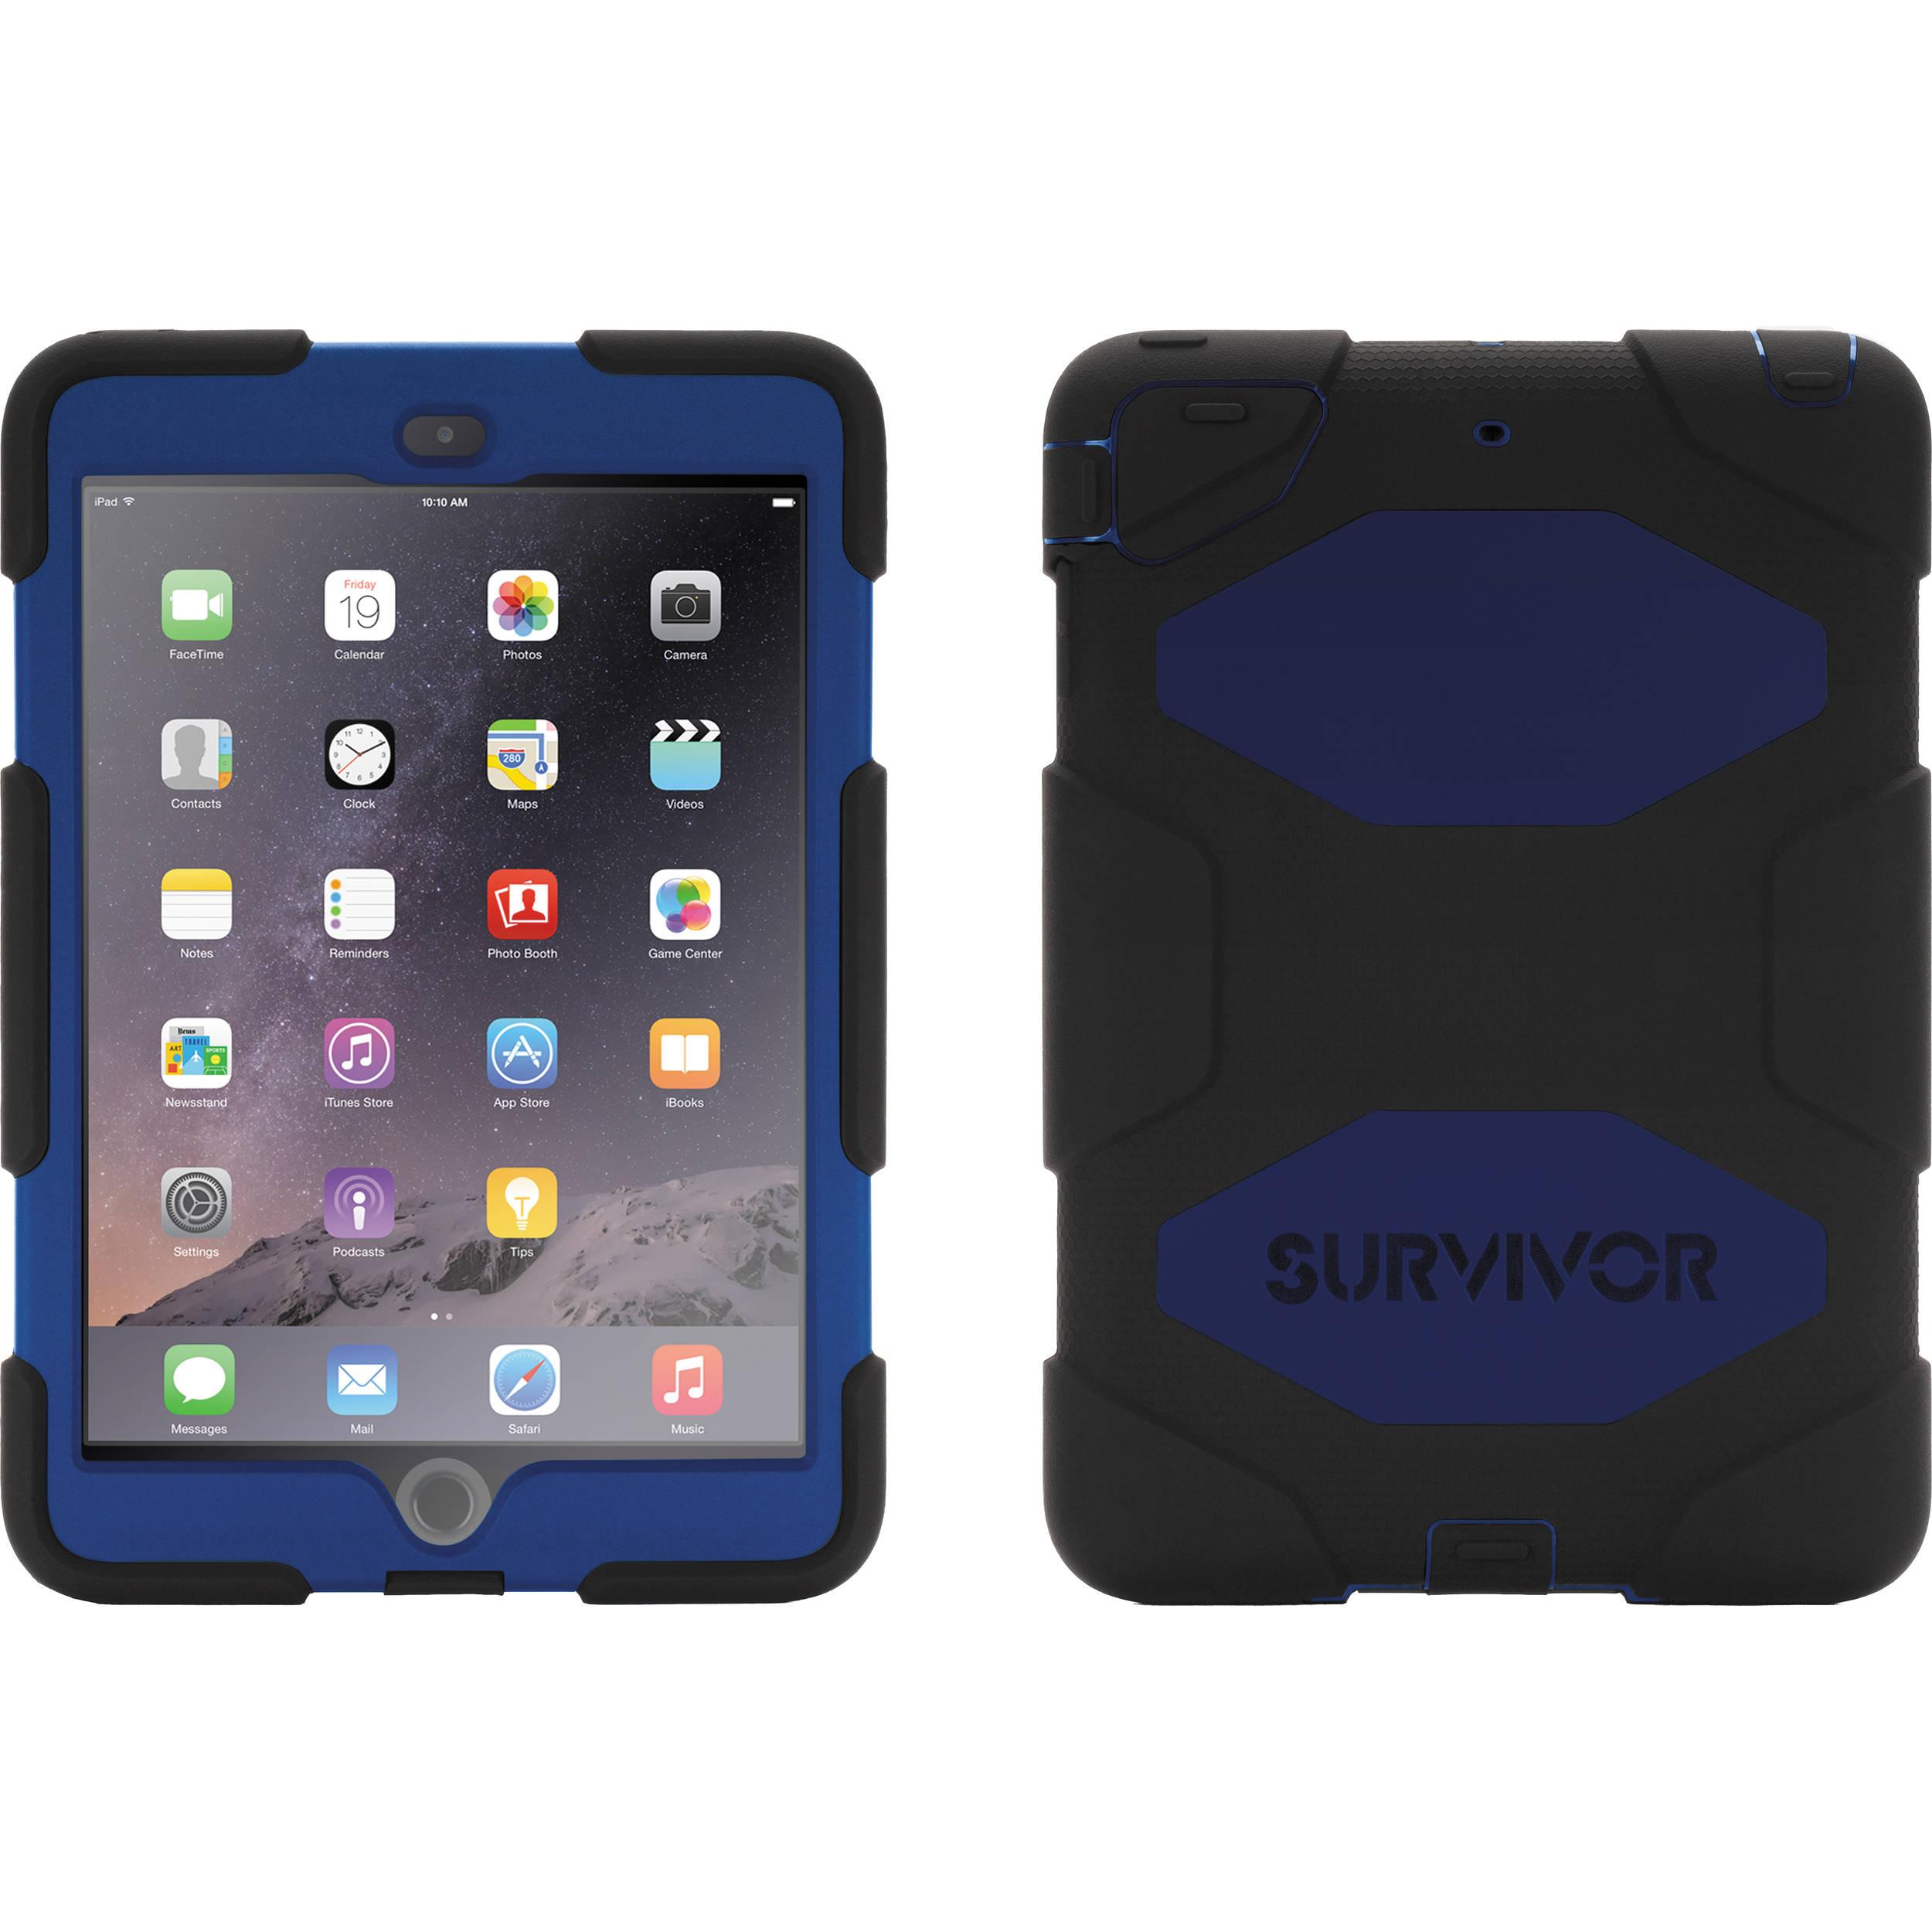 Griffin Technology Survivor Case for iPad mini, iPad GB35921-3